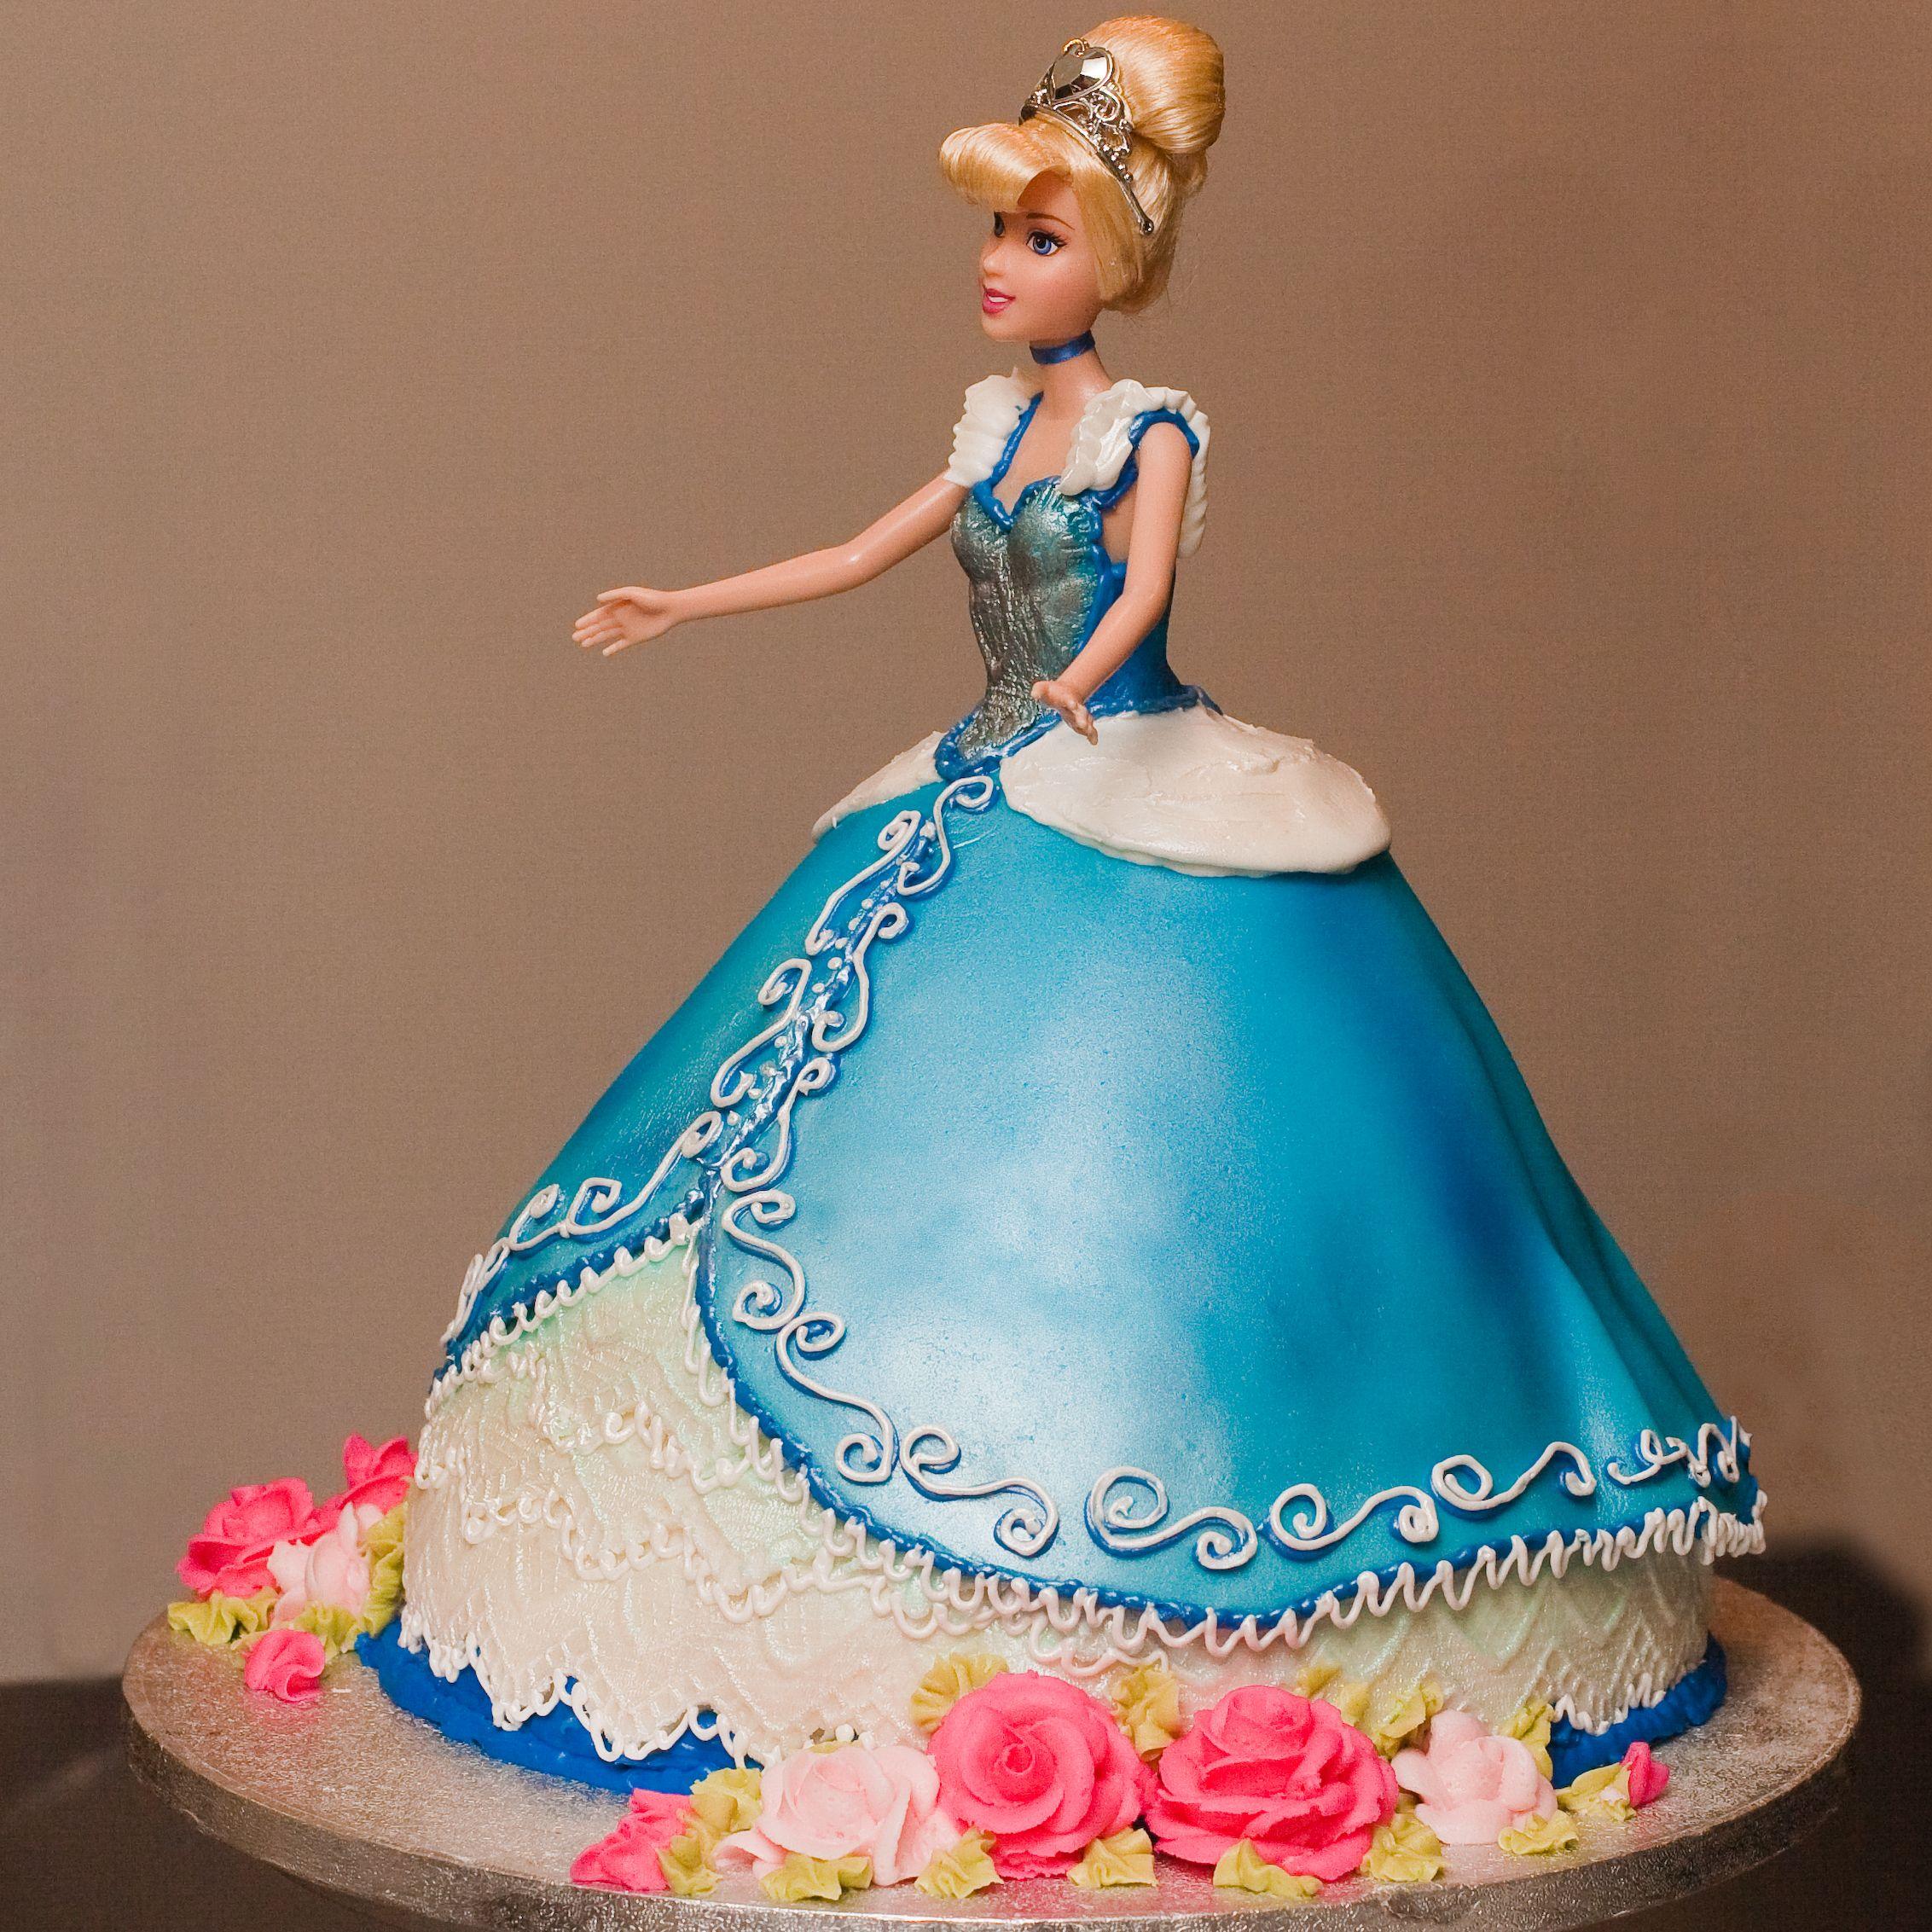 cinderella coach cakes Cinderella Cakes Decoration Ideas cakes